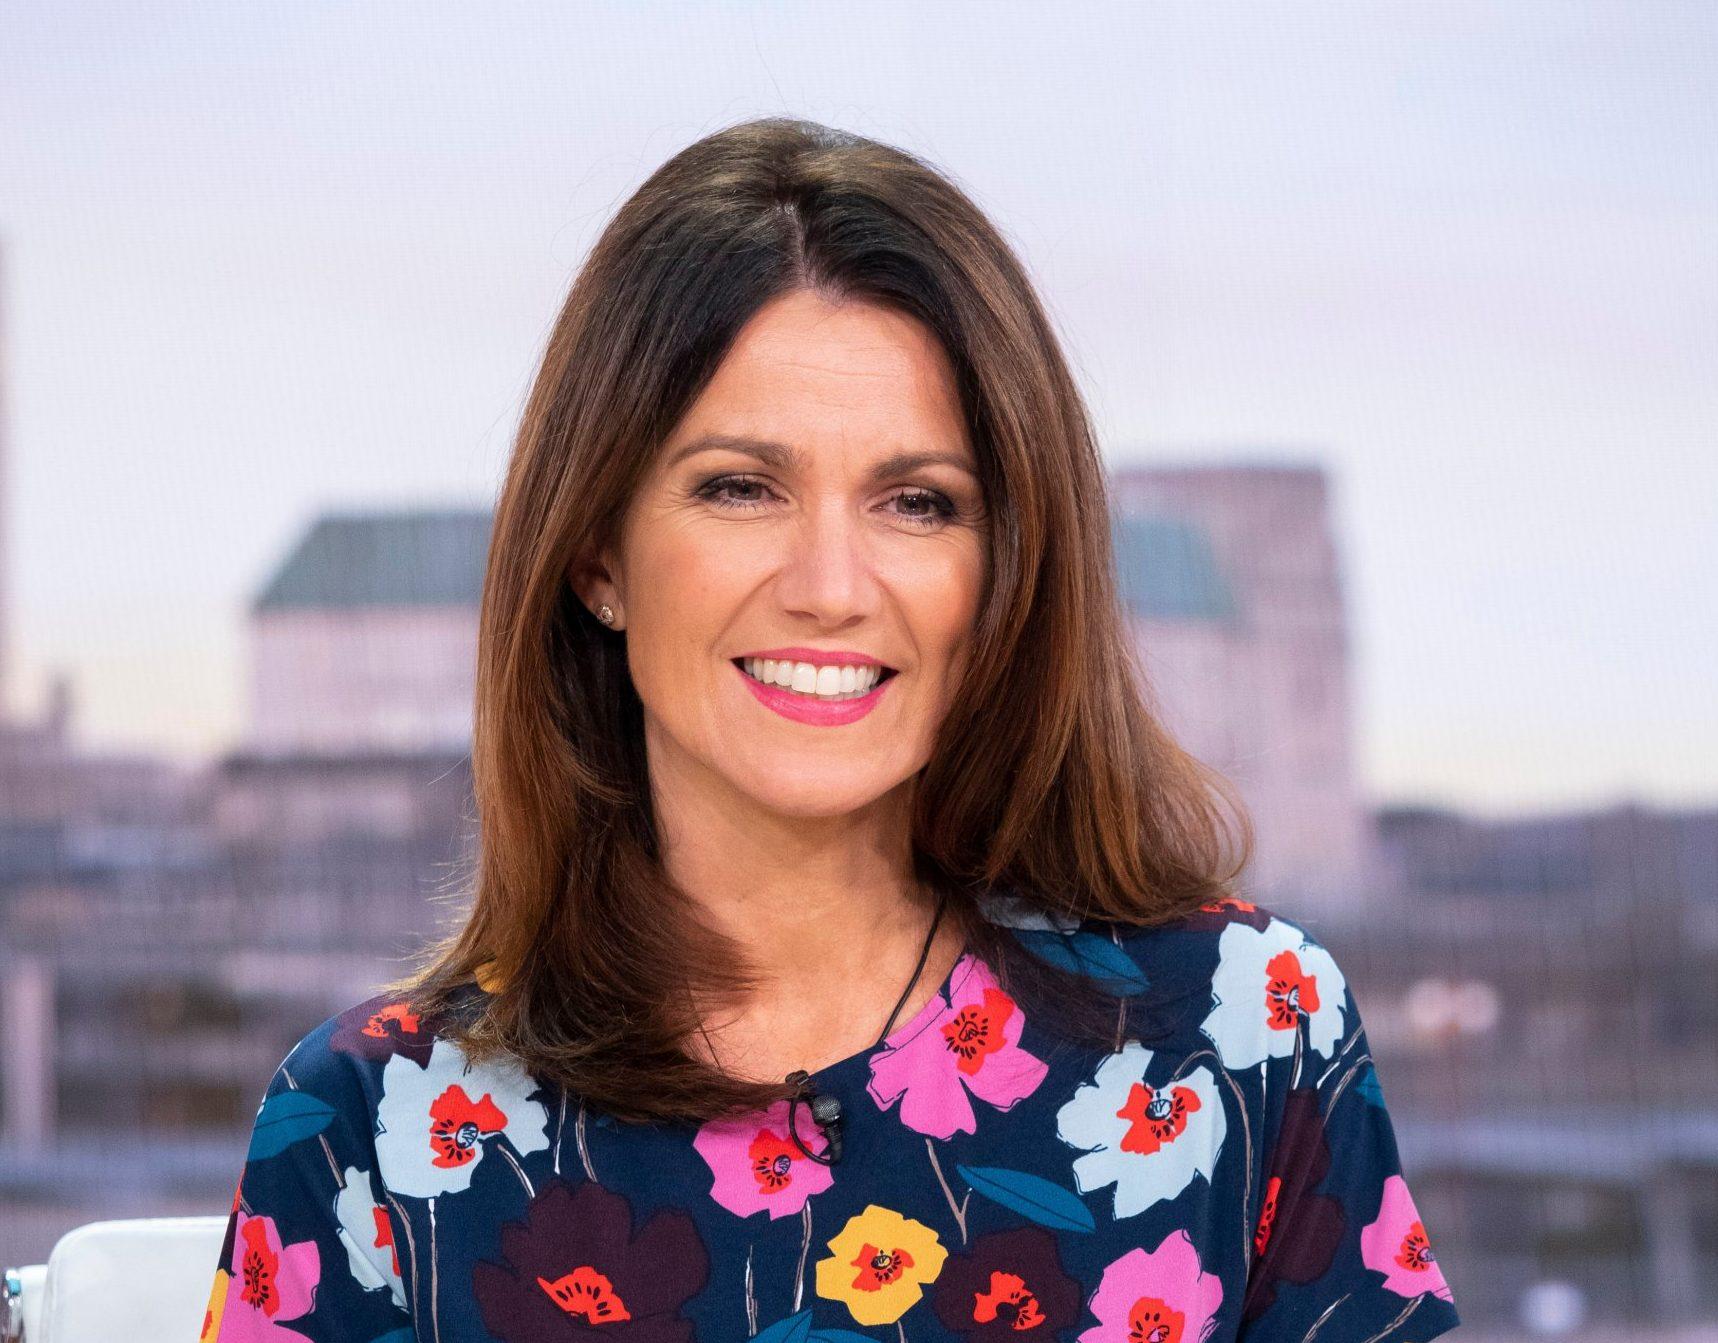 Editorial use only Mandatory Credit: Photo by Ken McKay/ITV/REX/Shutterstock (9922023ab) Susanna Reid 'Good Morning Britain' TV show, London, UK - 11 Oct 2018